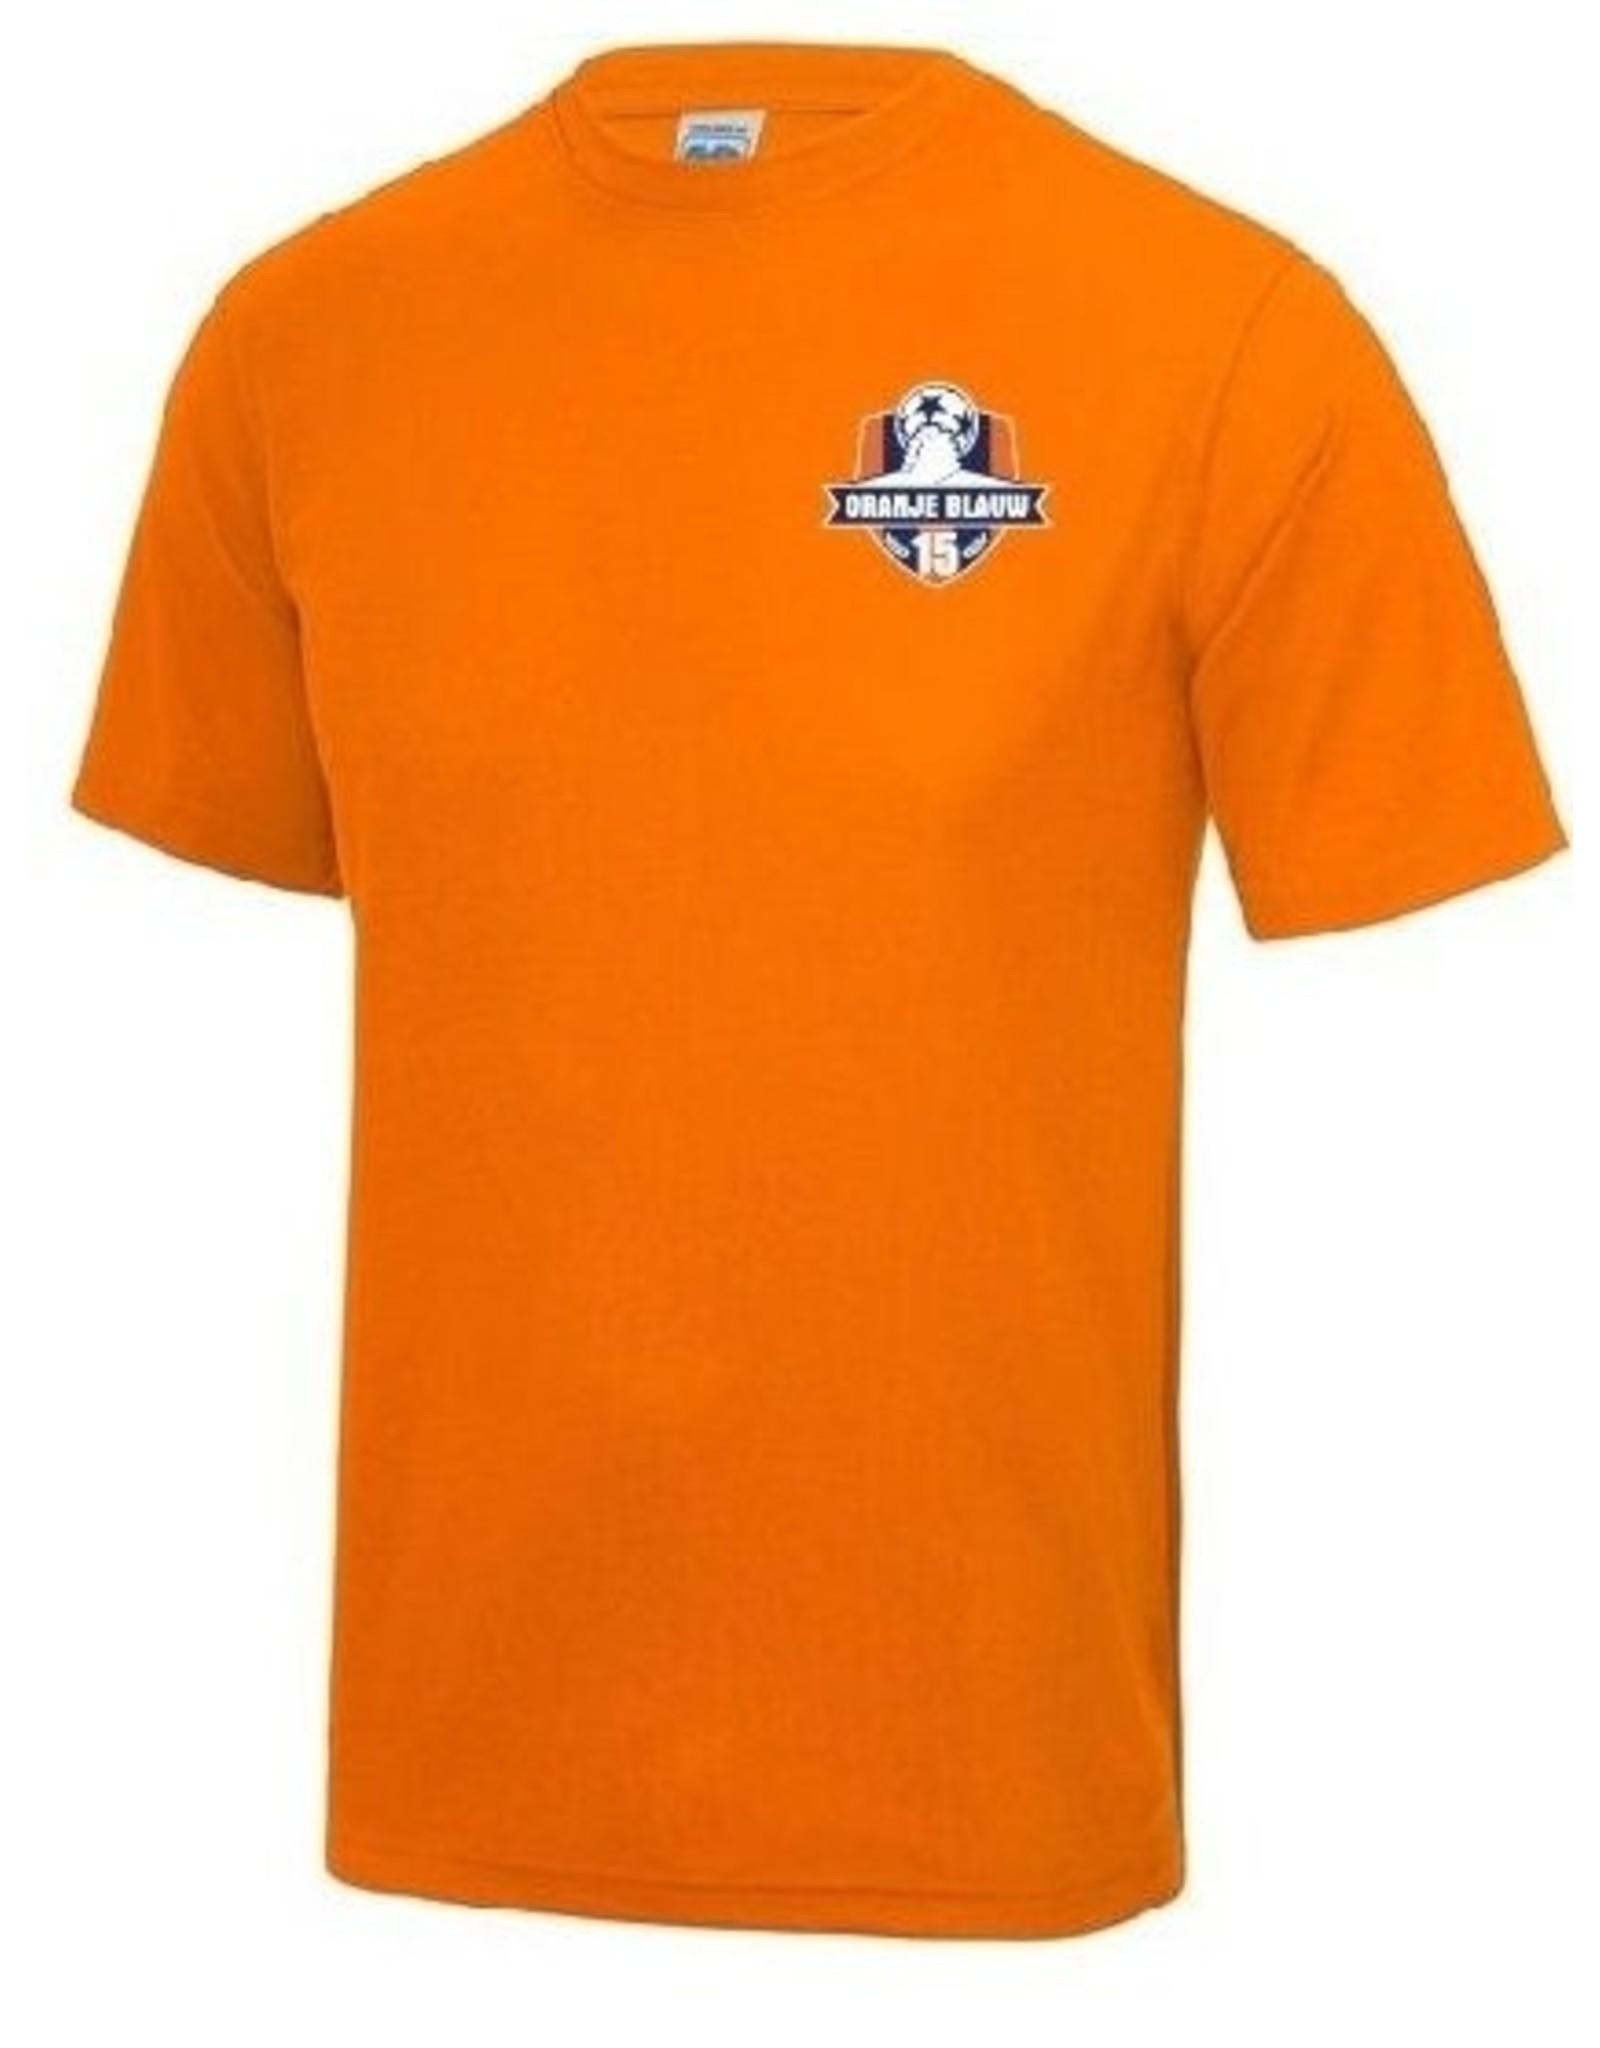 Oranje Blauw'15 inloopshirt inclusief logo